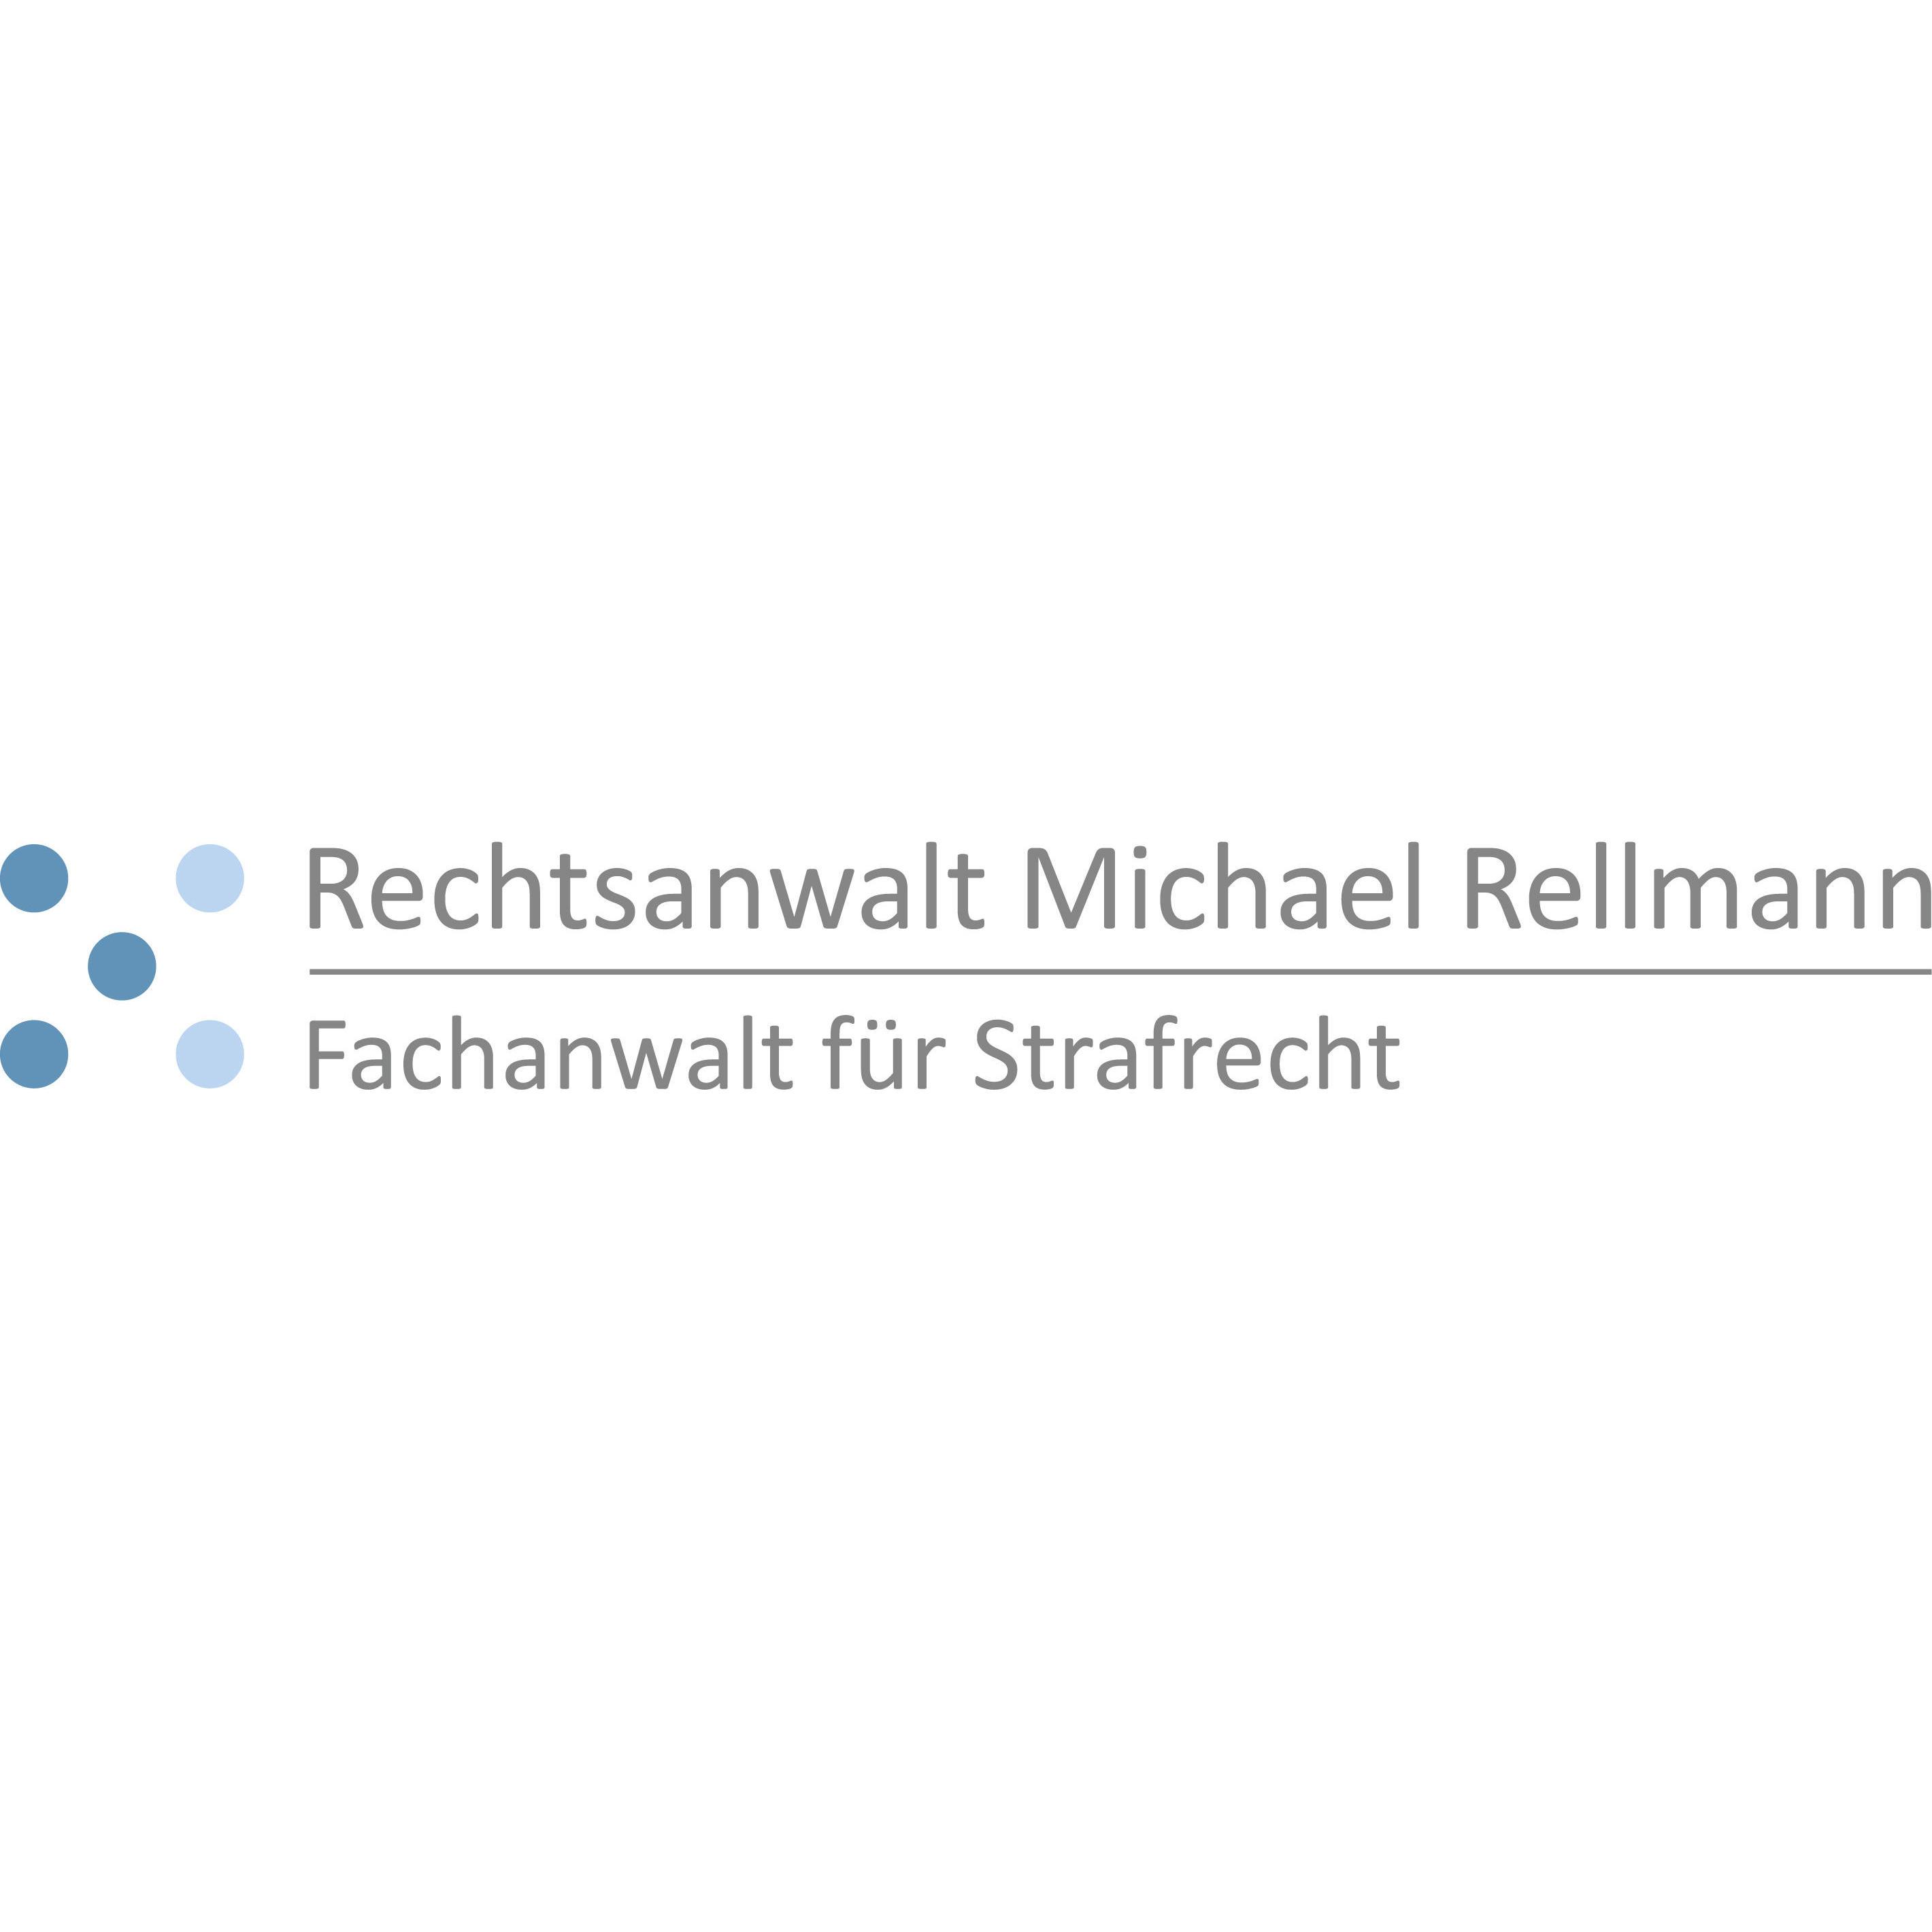 Michael Rellmann